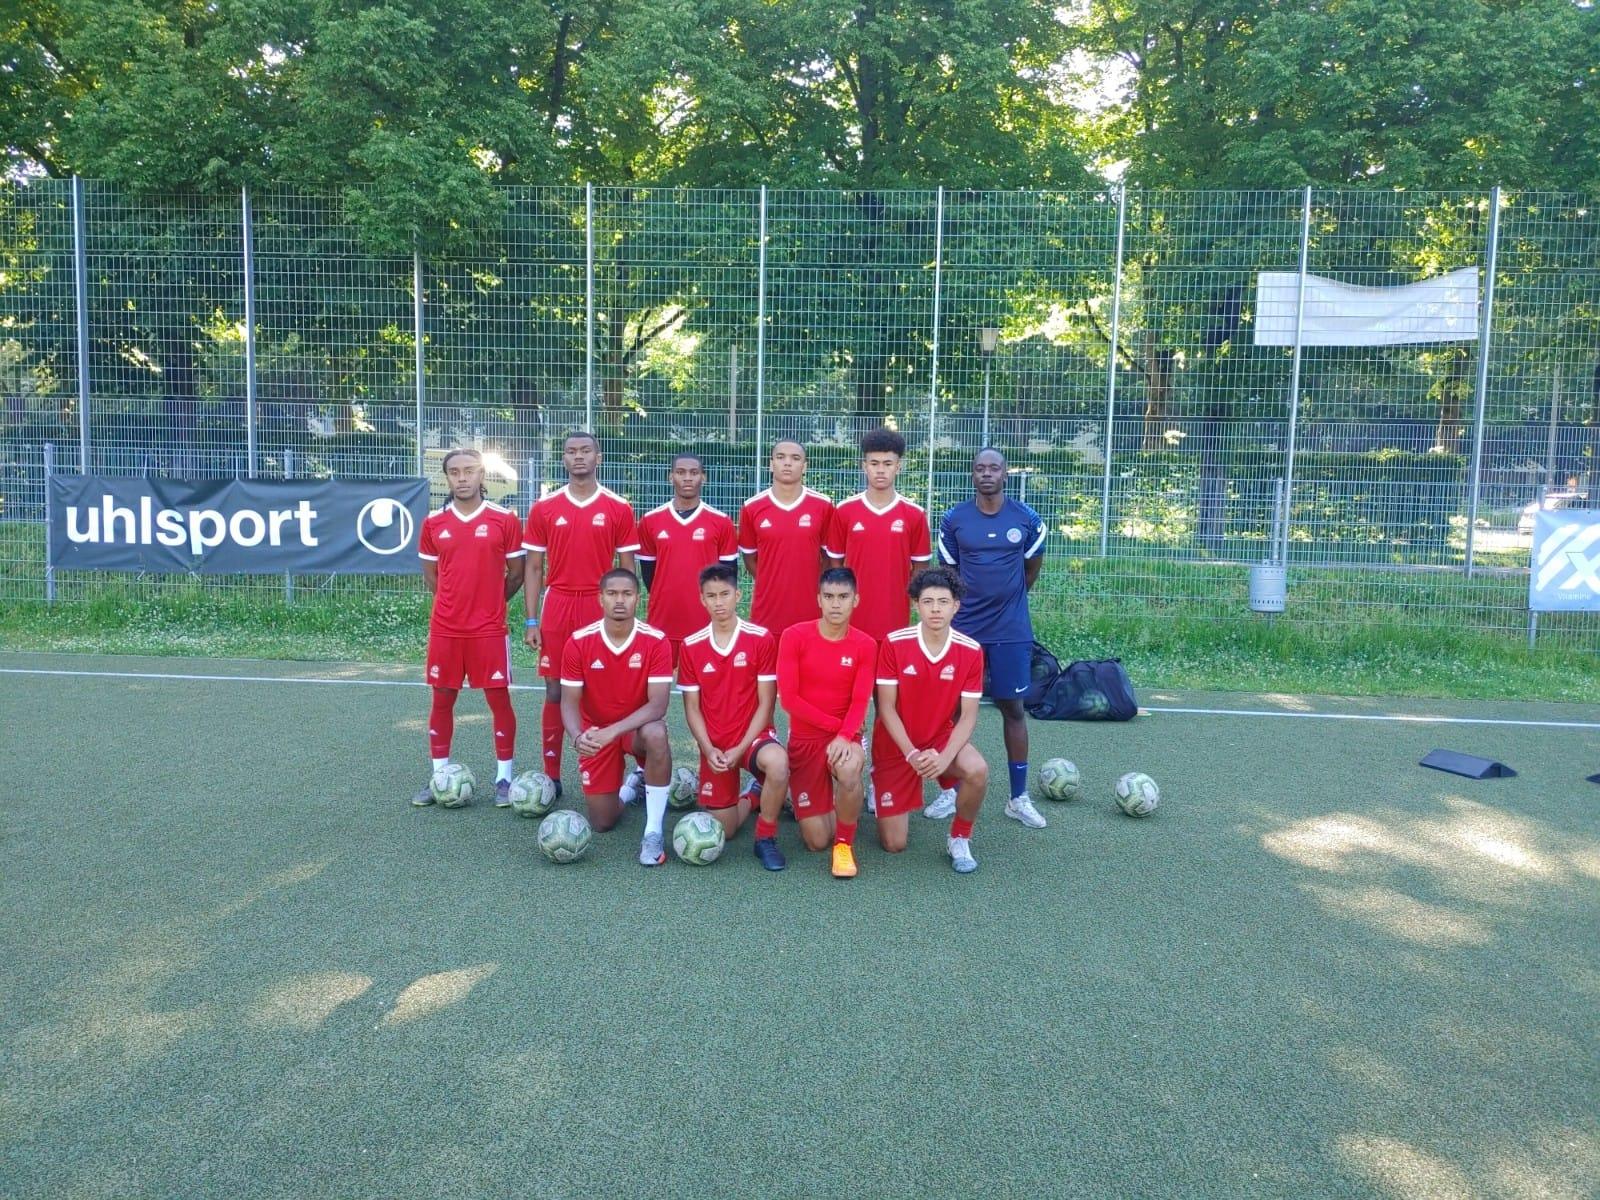 Munich Football School Munich Germany - 3